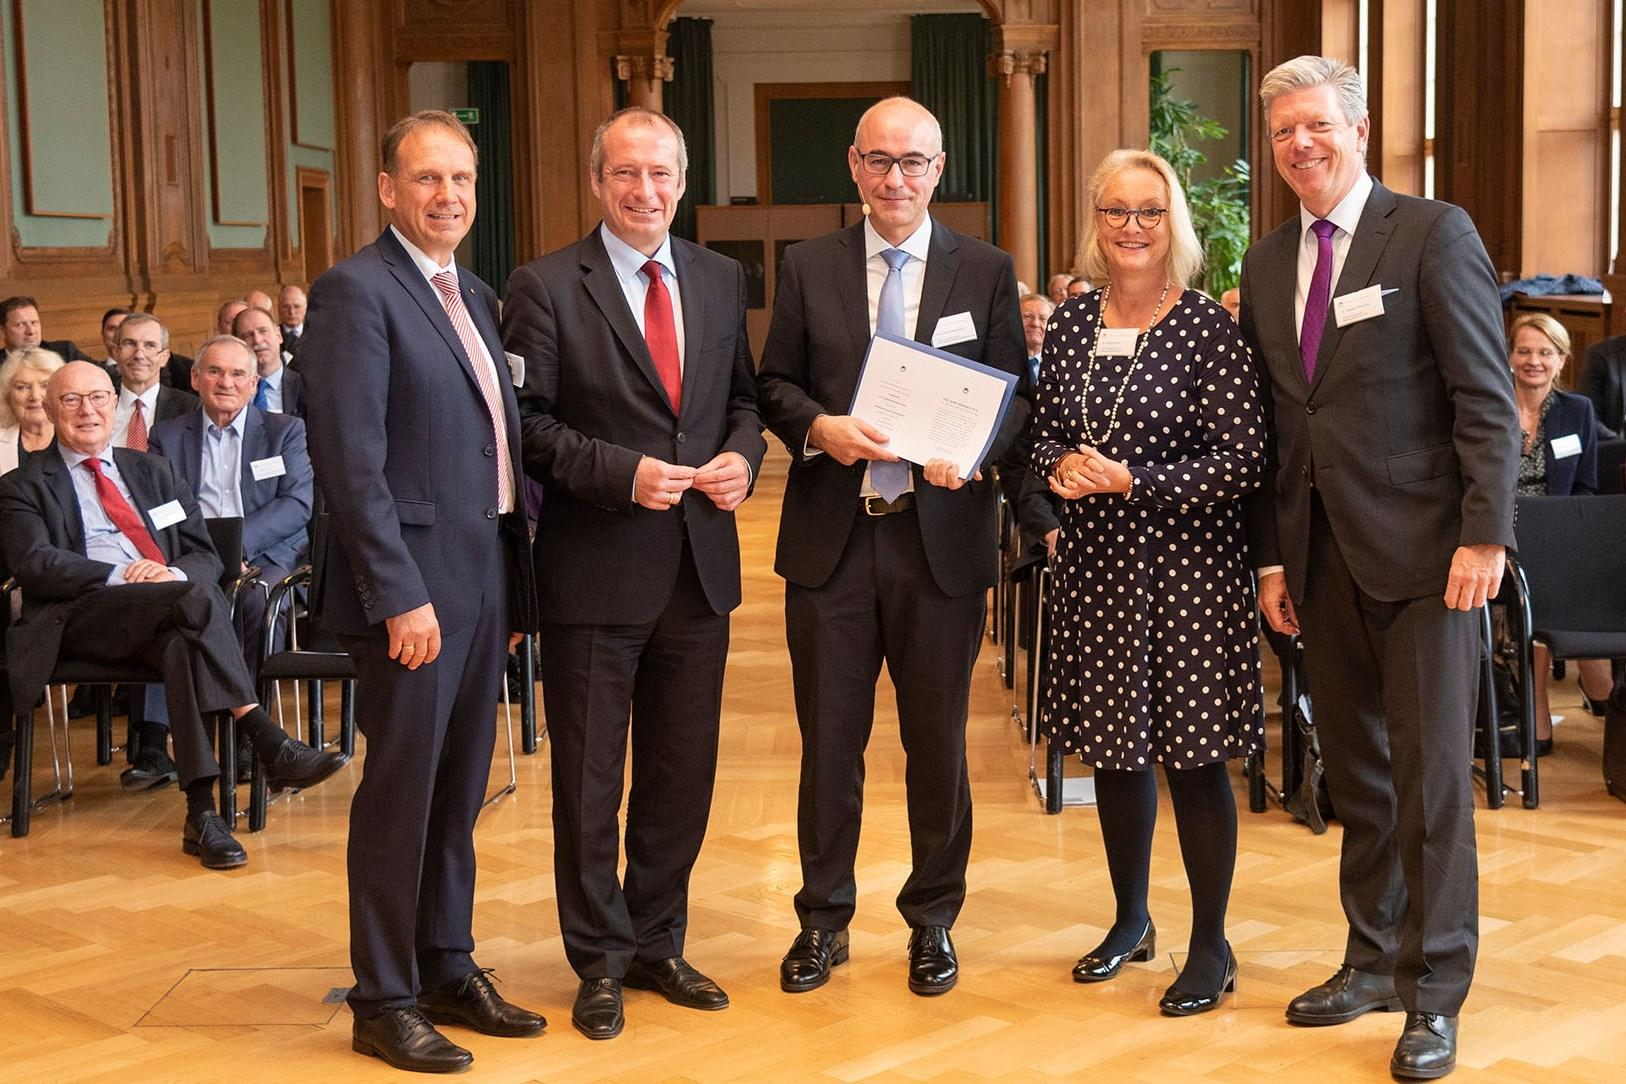 MP a.D. Dieter Althaus, PSt. Oliver Wittke, Prof. Achim Wambach, Dr. Birgit Ortlieb, Dr. Ansgar Tietmeyer (v.l.)